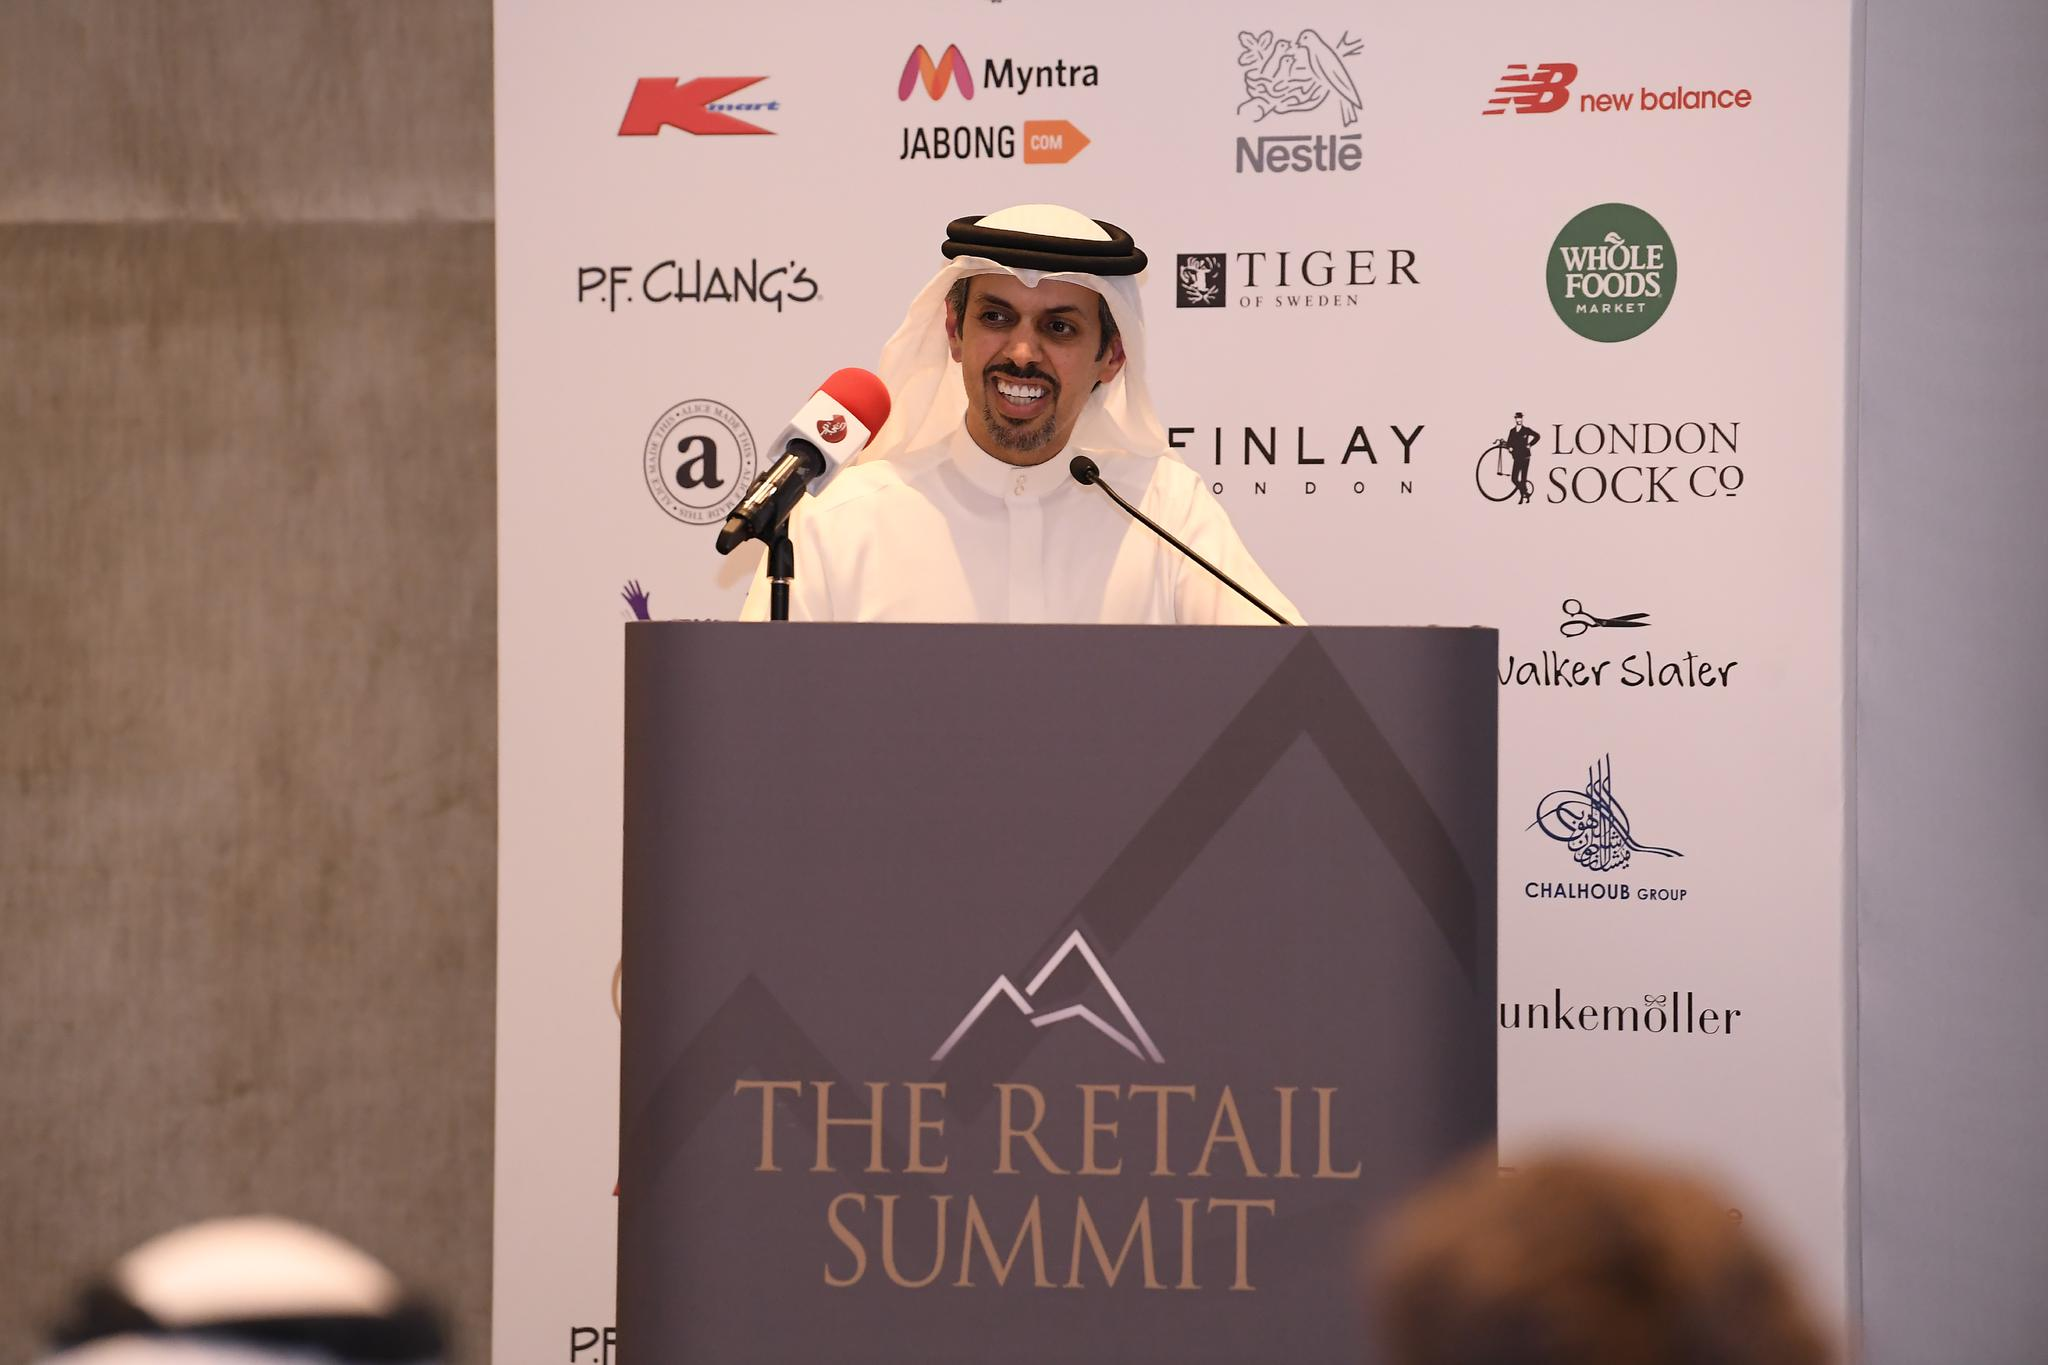 Value of Dubai's retail market grew to $35 billion in 2017